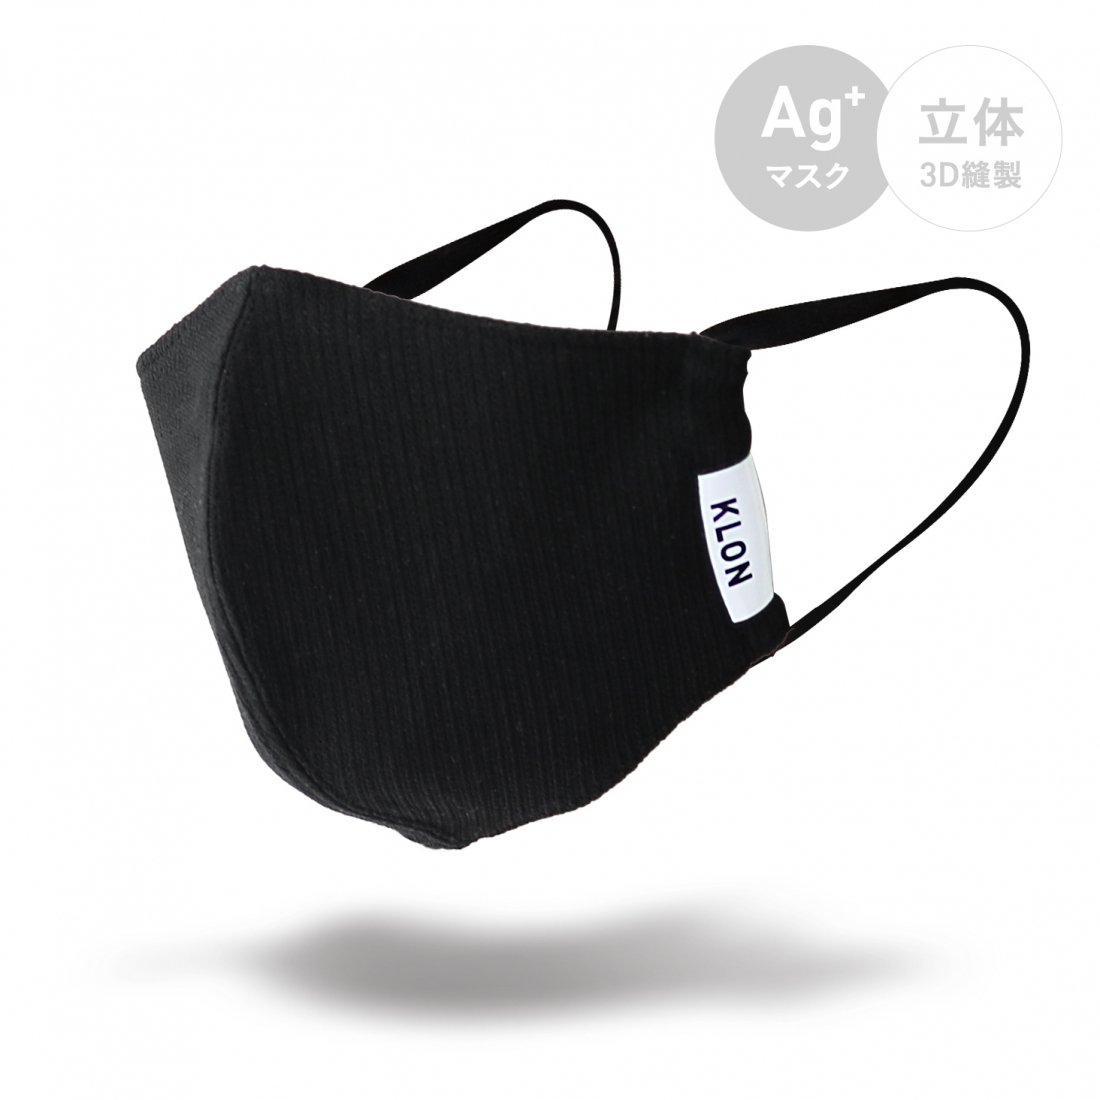 KLON Ag+ 3D MASK BLACK